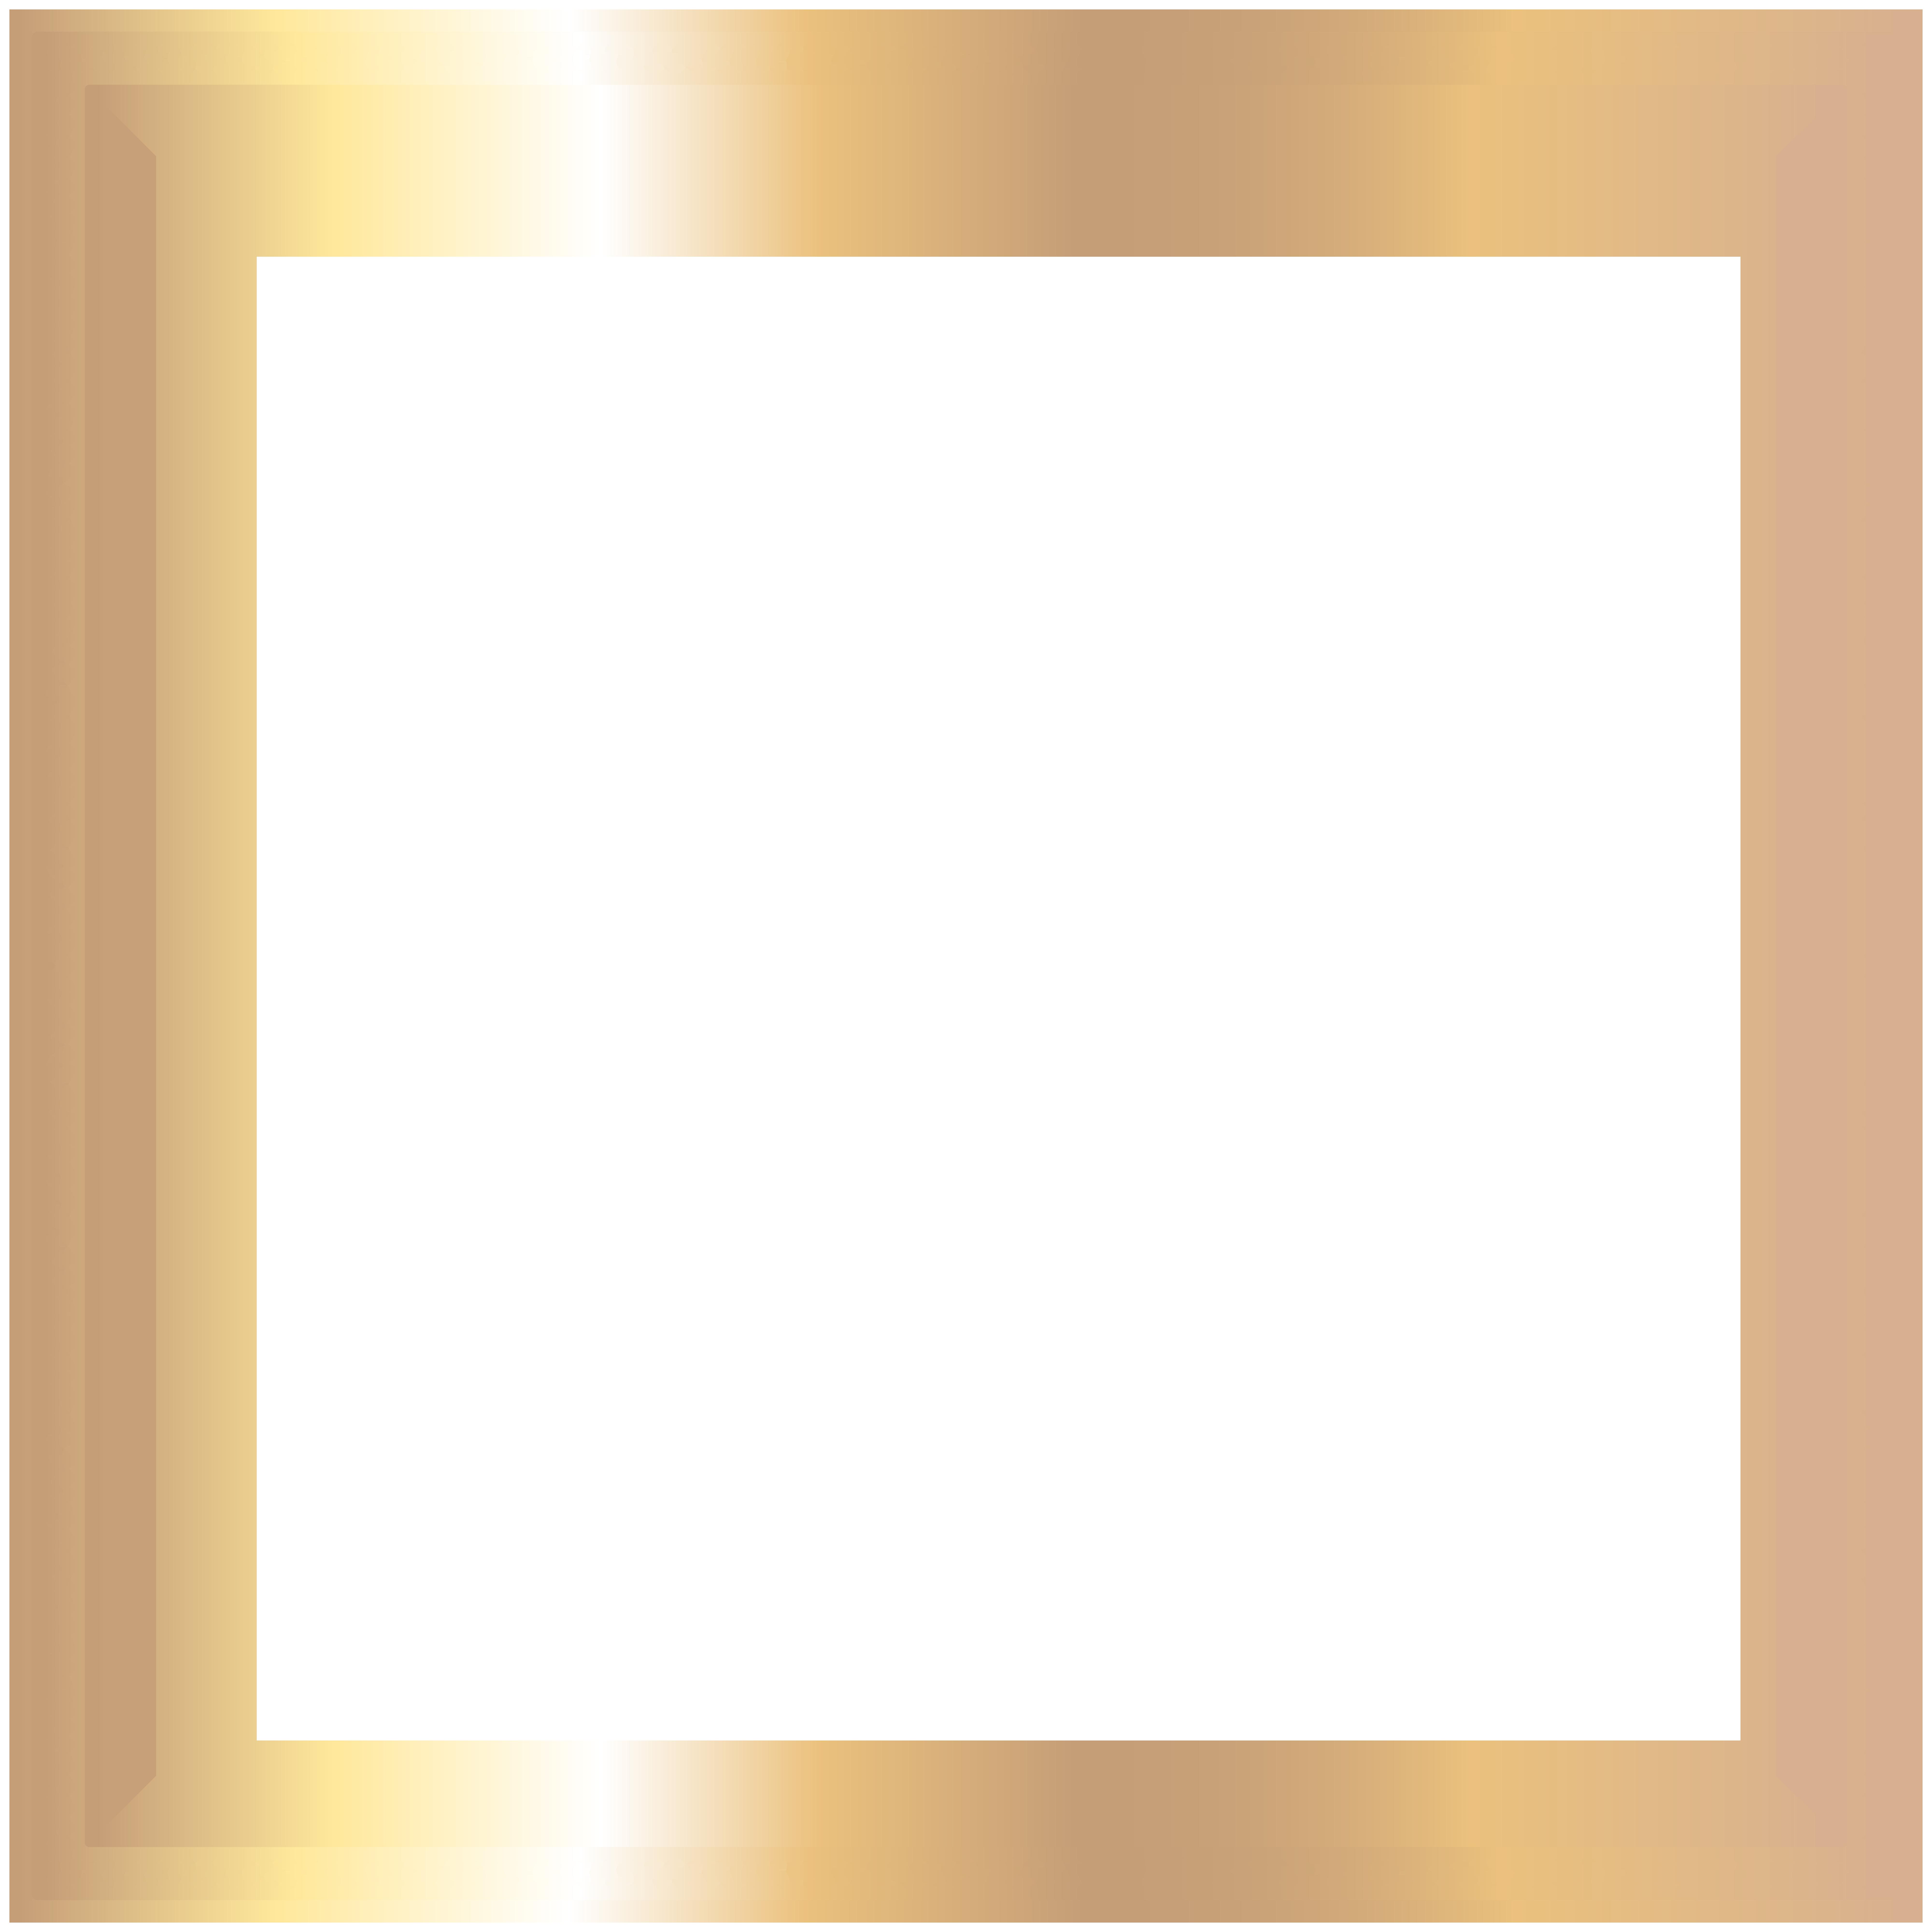 Transparent frame png clip. Square clipart photograph border